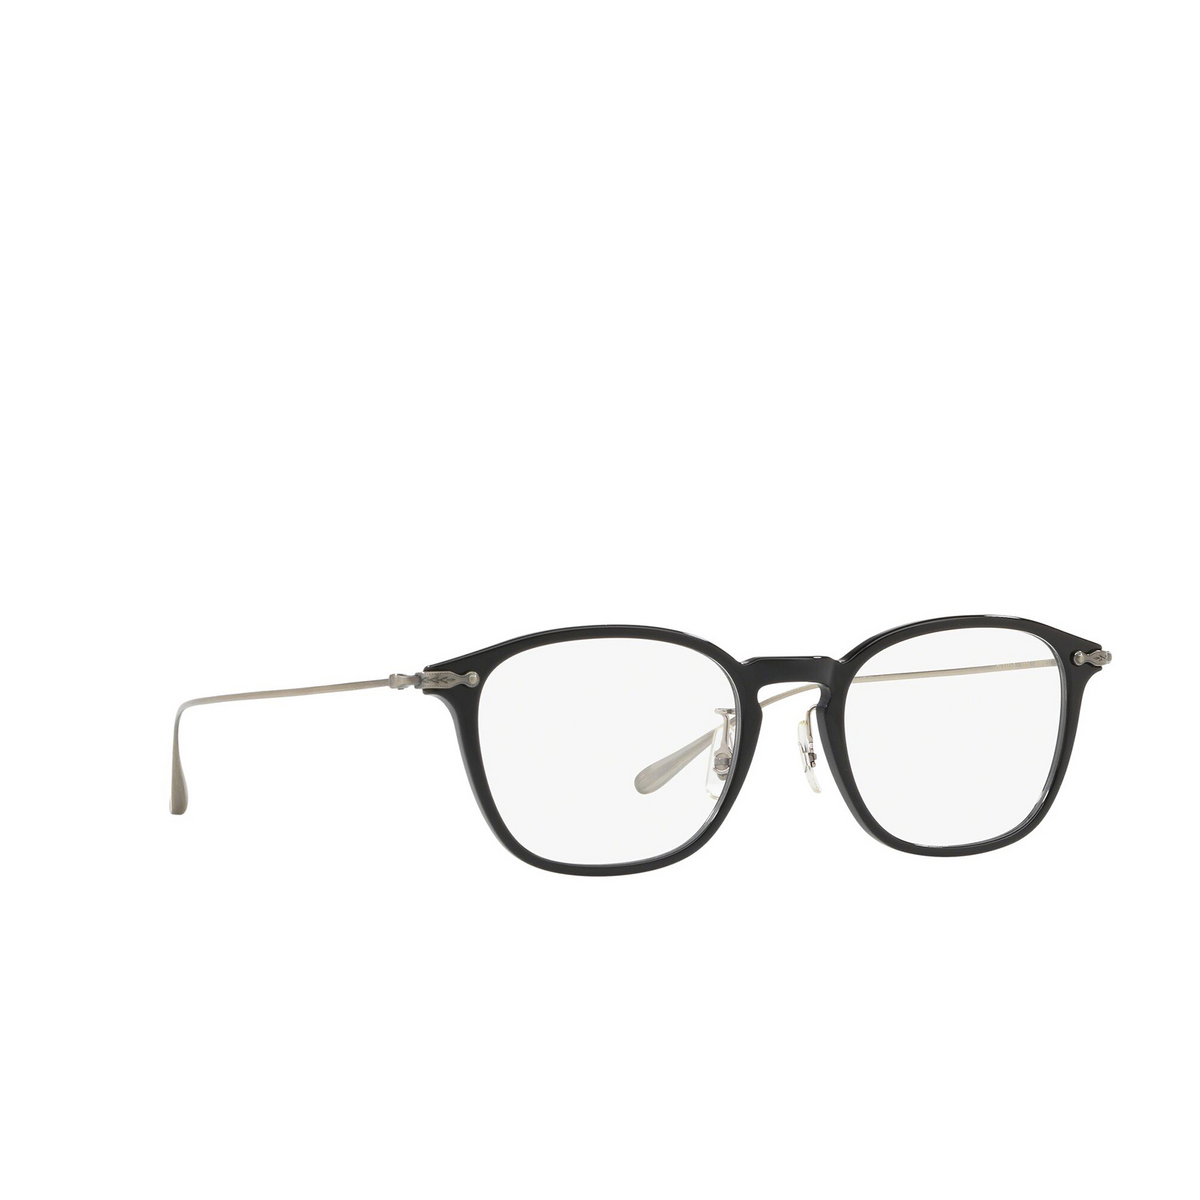 Oliver Peoples® Rectangle Eyeglasses: OV5371D color Black 1005 - three-quarters view.